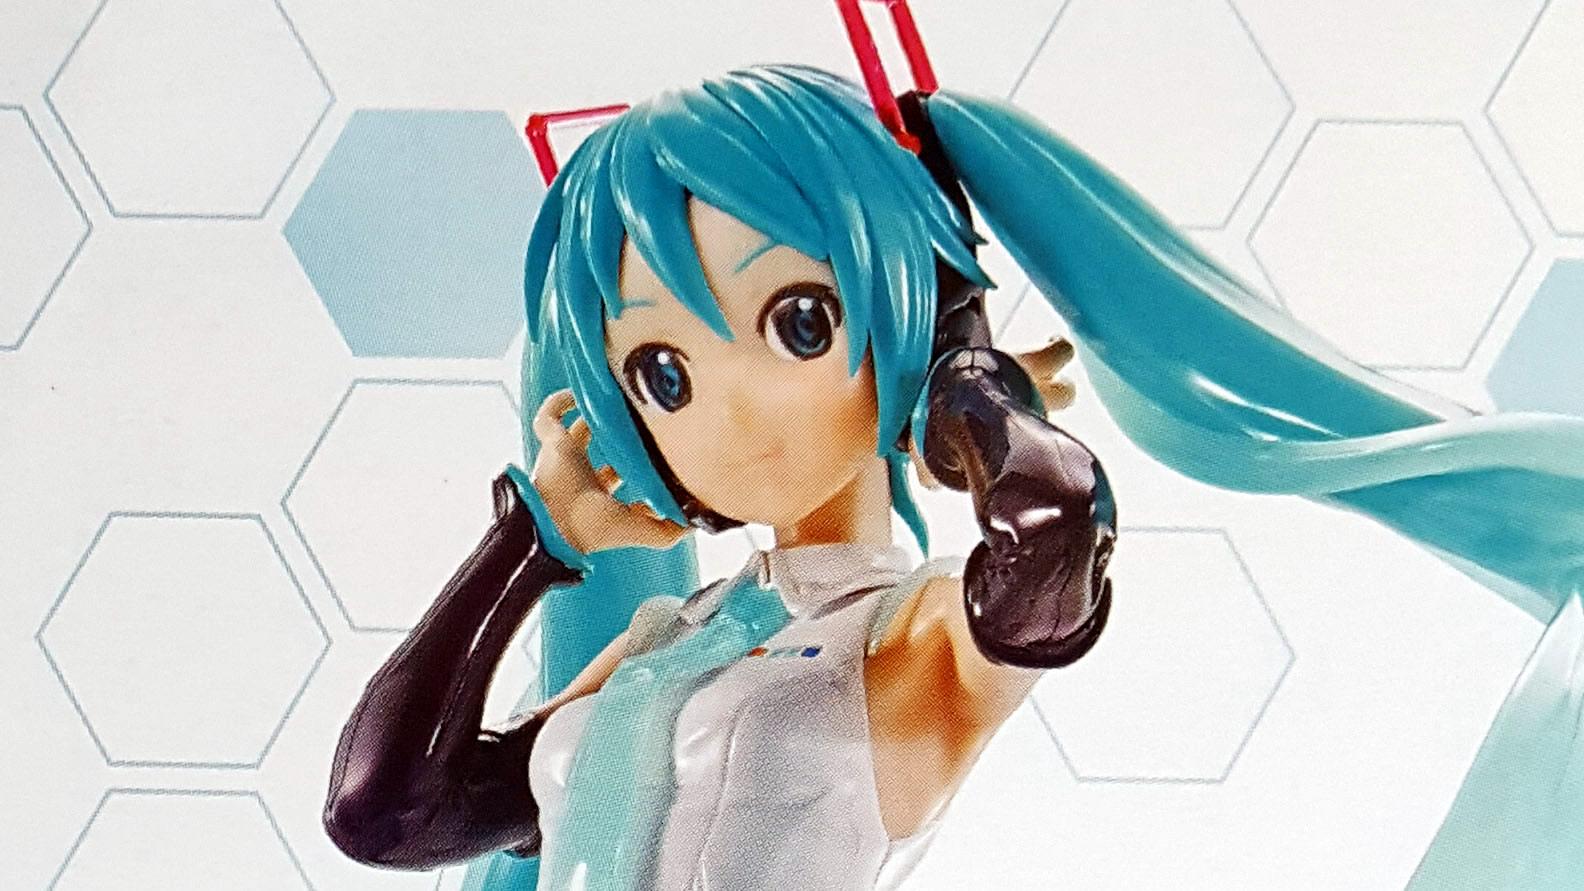 Bandai Figure-Rise LABO Vocaloid Hatsune Miku V4X Model Kit USA Seller